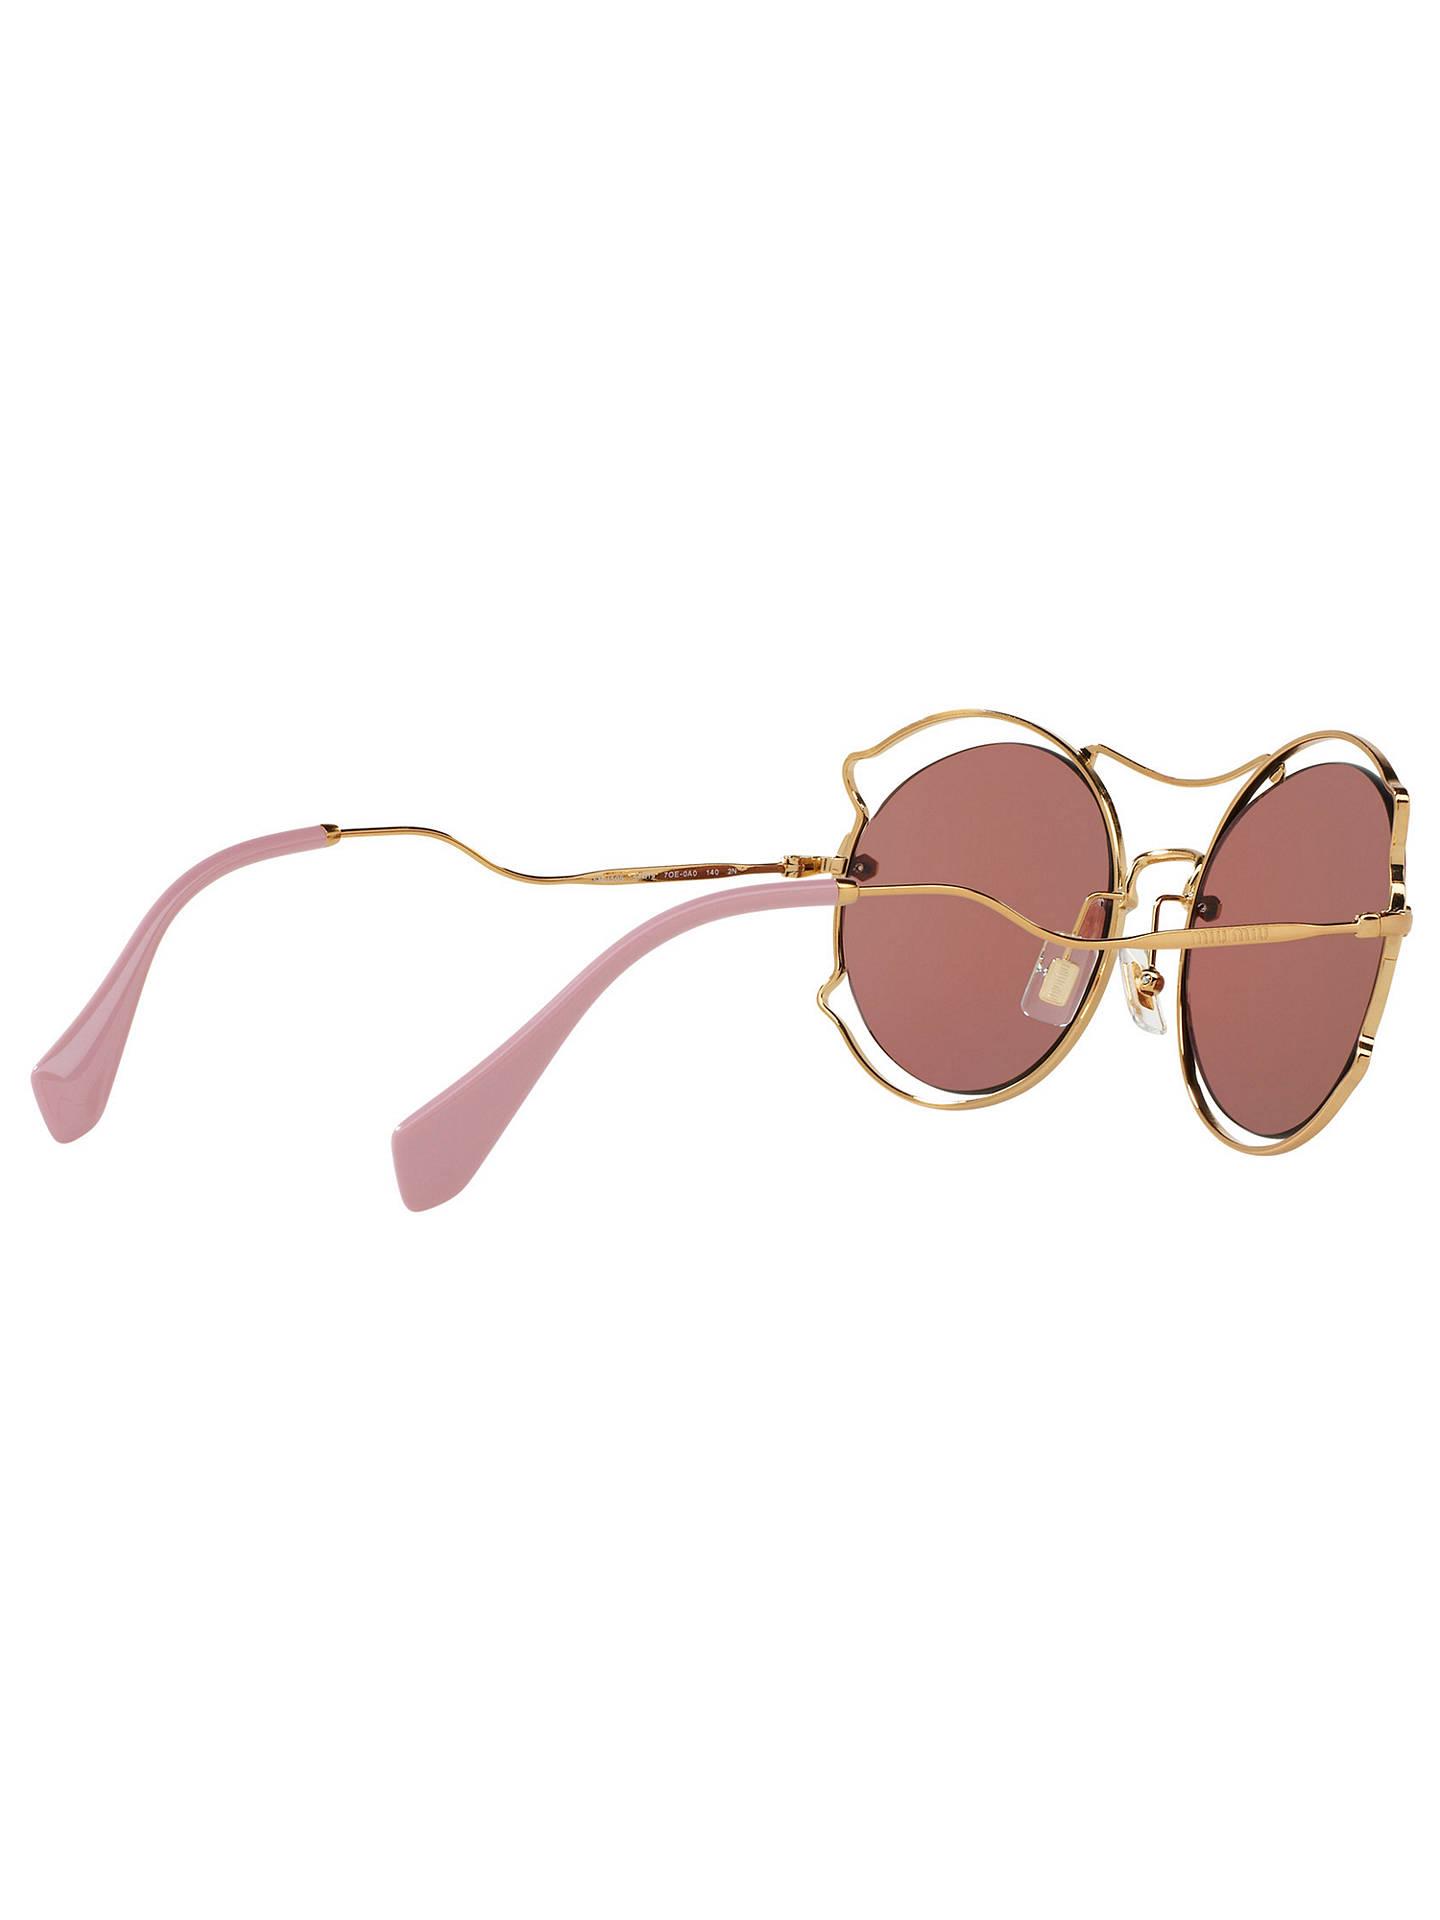 9ca43322acda Buy Miu Miu MU 50SS Geometric Sunglasses, Gold/Dark Pink Online at  johnlewis.